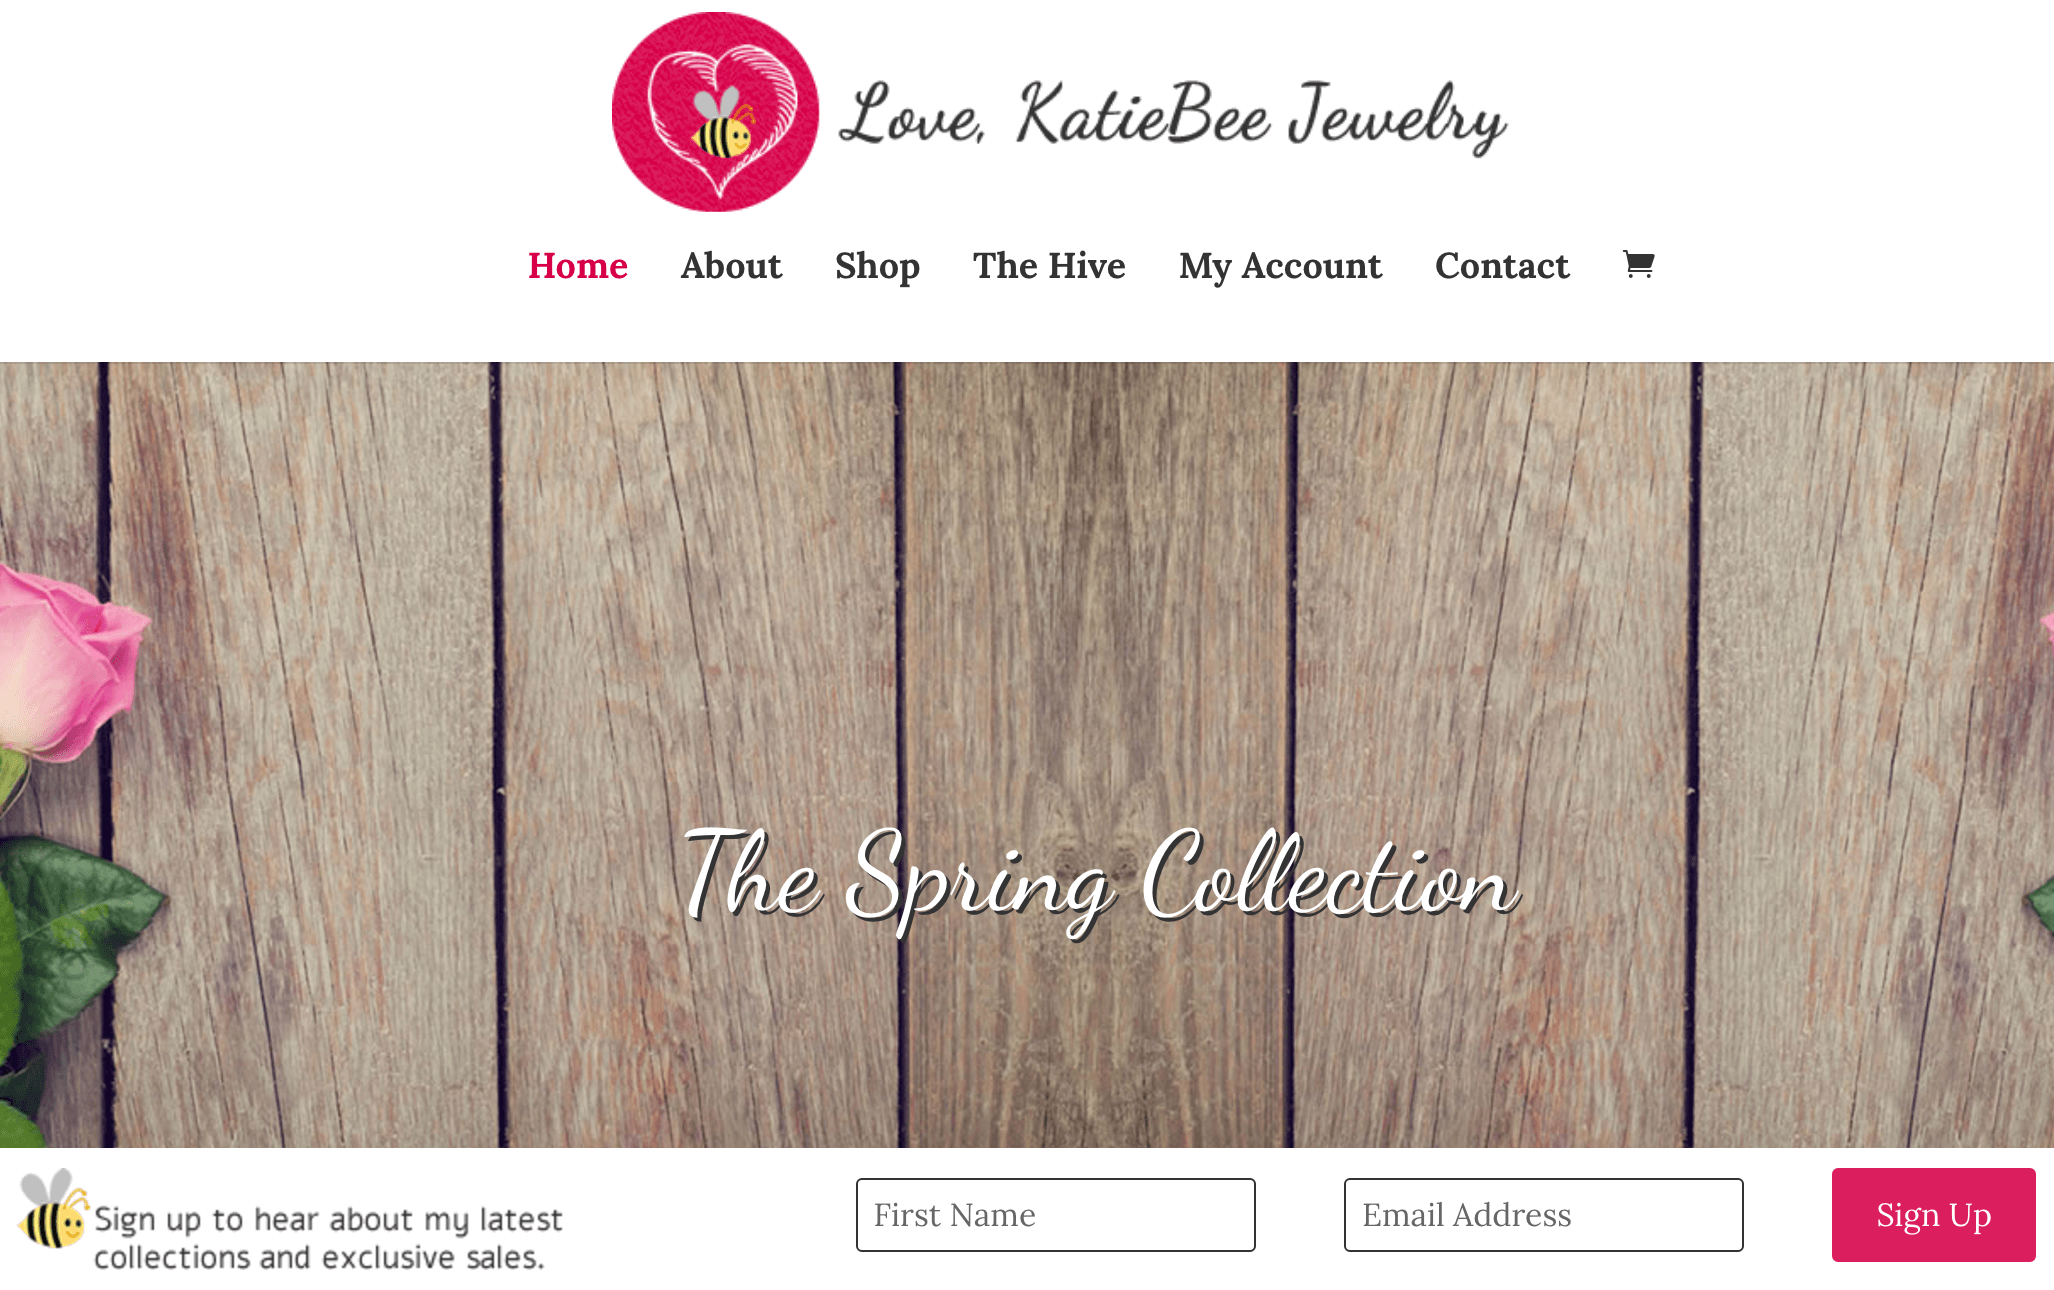 The KatieBee Jewelry homepage.